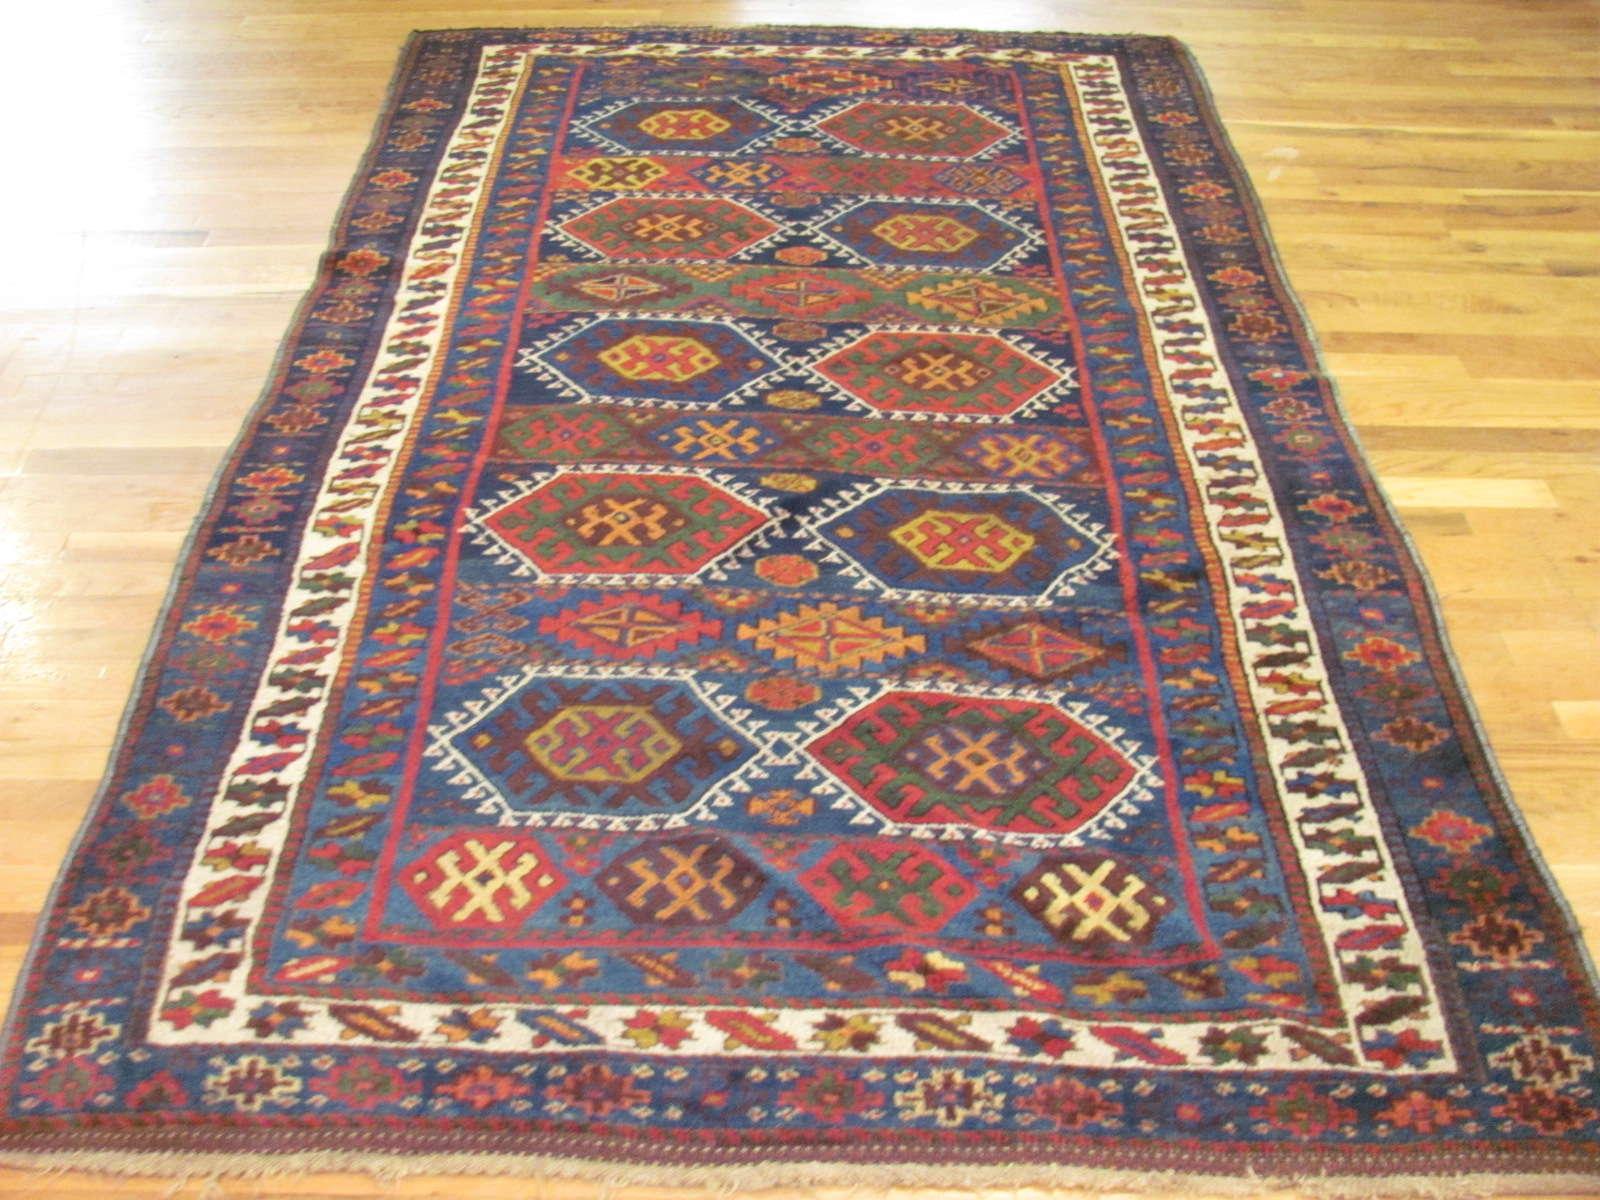 Joffee Kurd Rug | Persia | Handmade | Antique Circa 1910